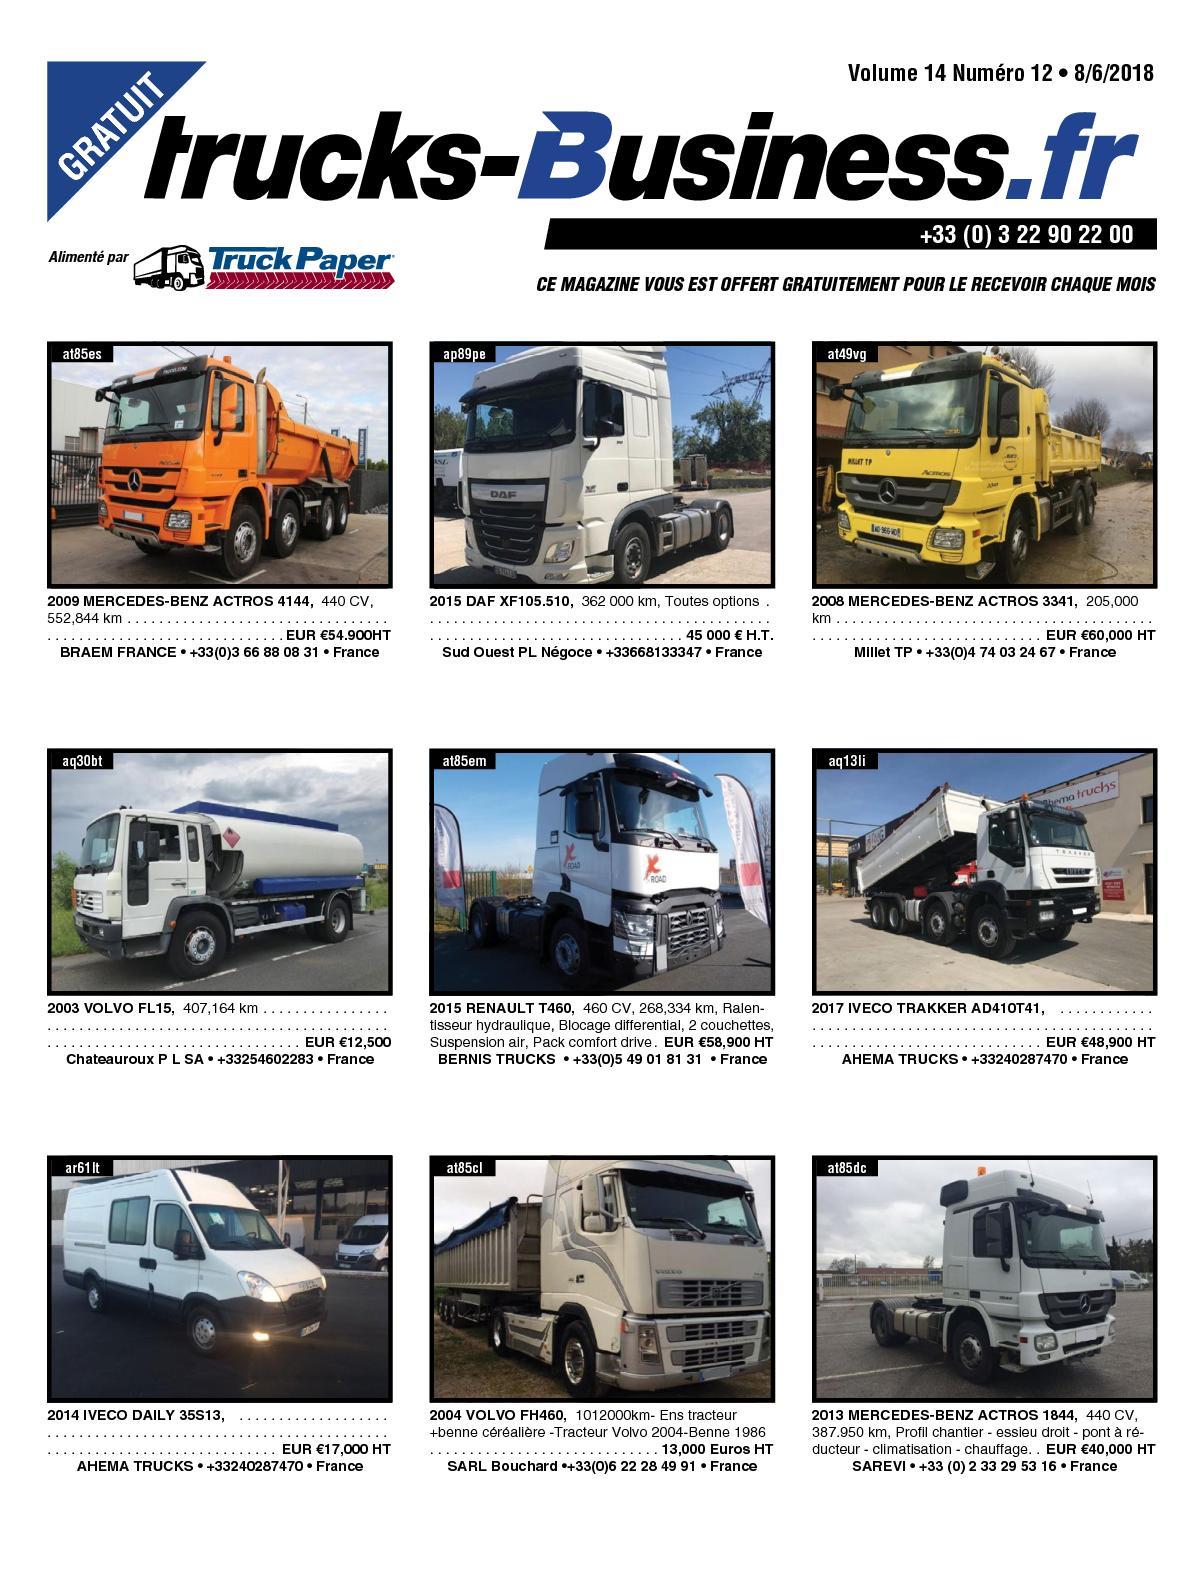 Calaméo Trucks Business Volume 14 Numéro 12 080618